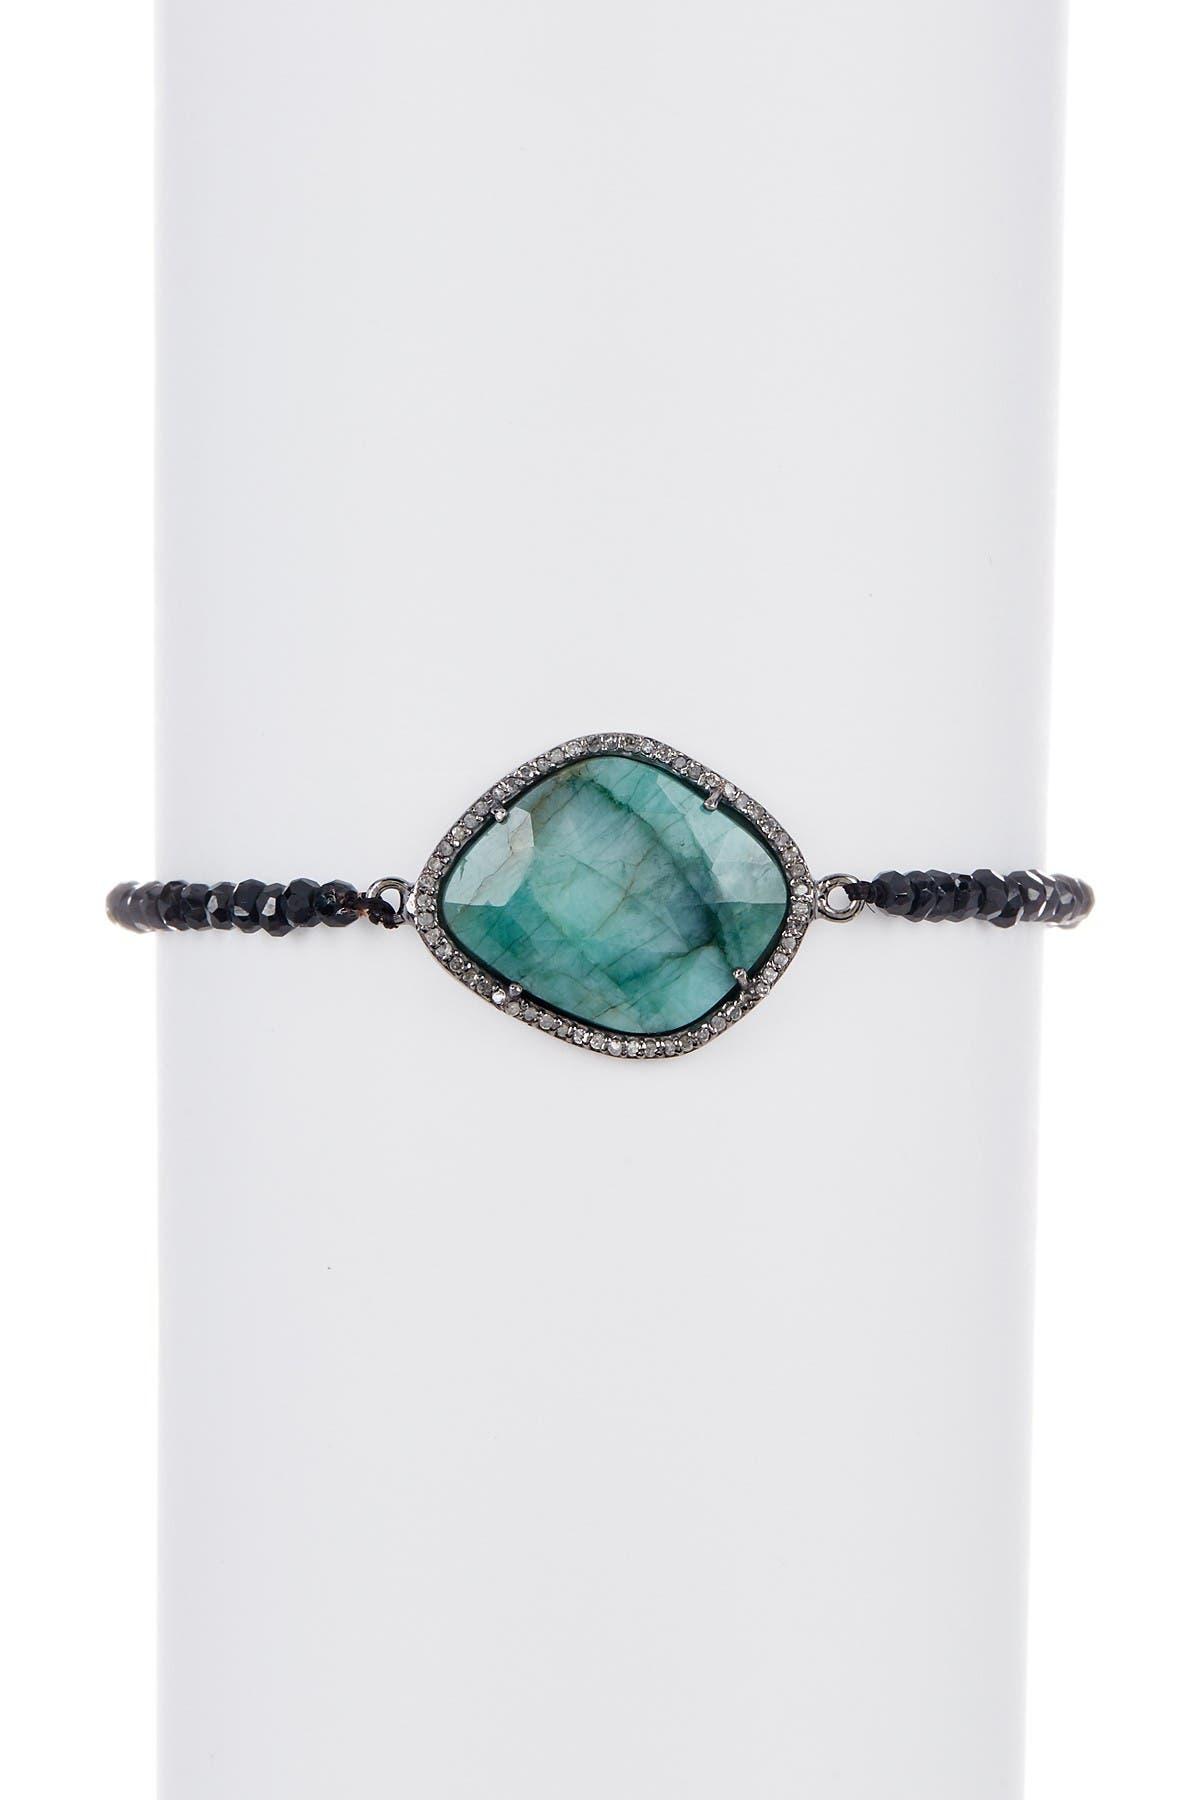 Image of ADORNIA Fine Sterling Silver Cayenne Champagne Diamond, Emerald, & Black Spinel Bracelet